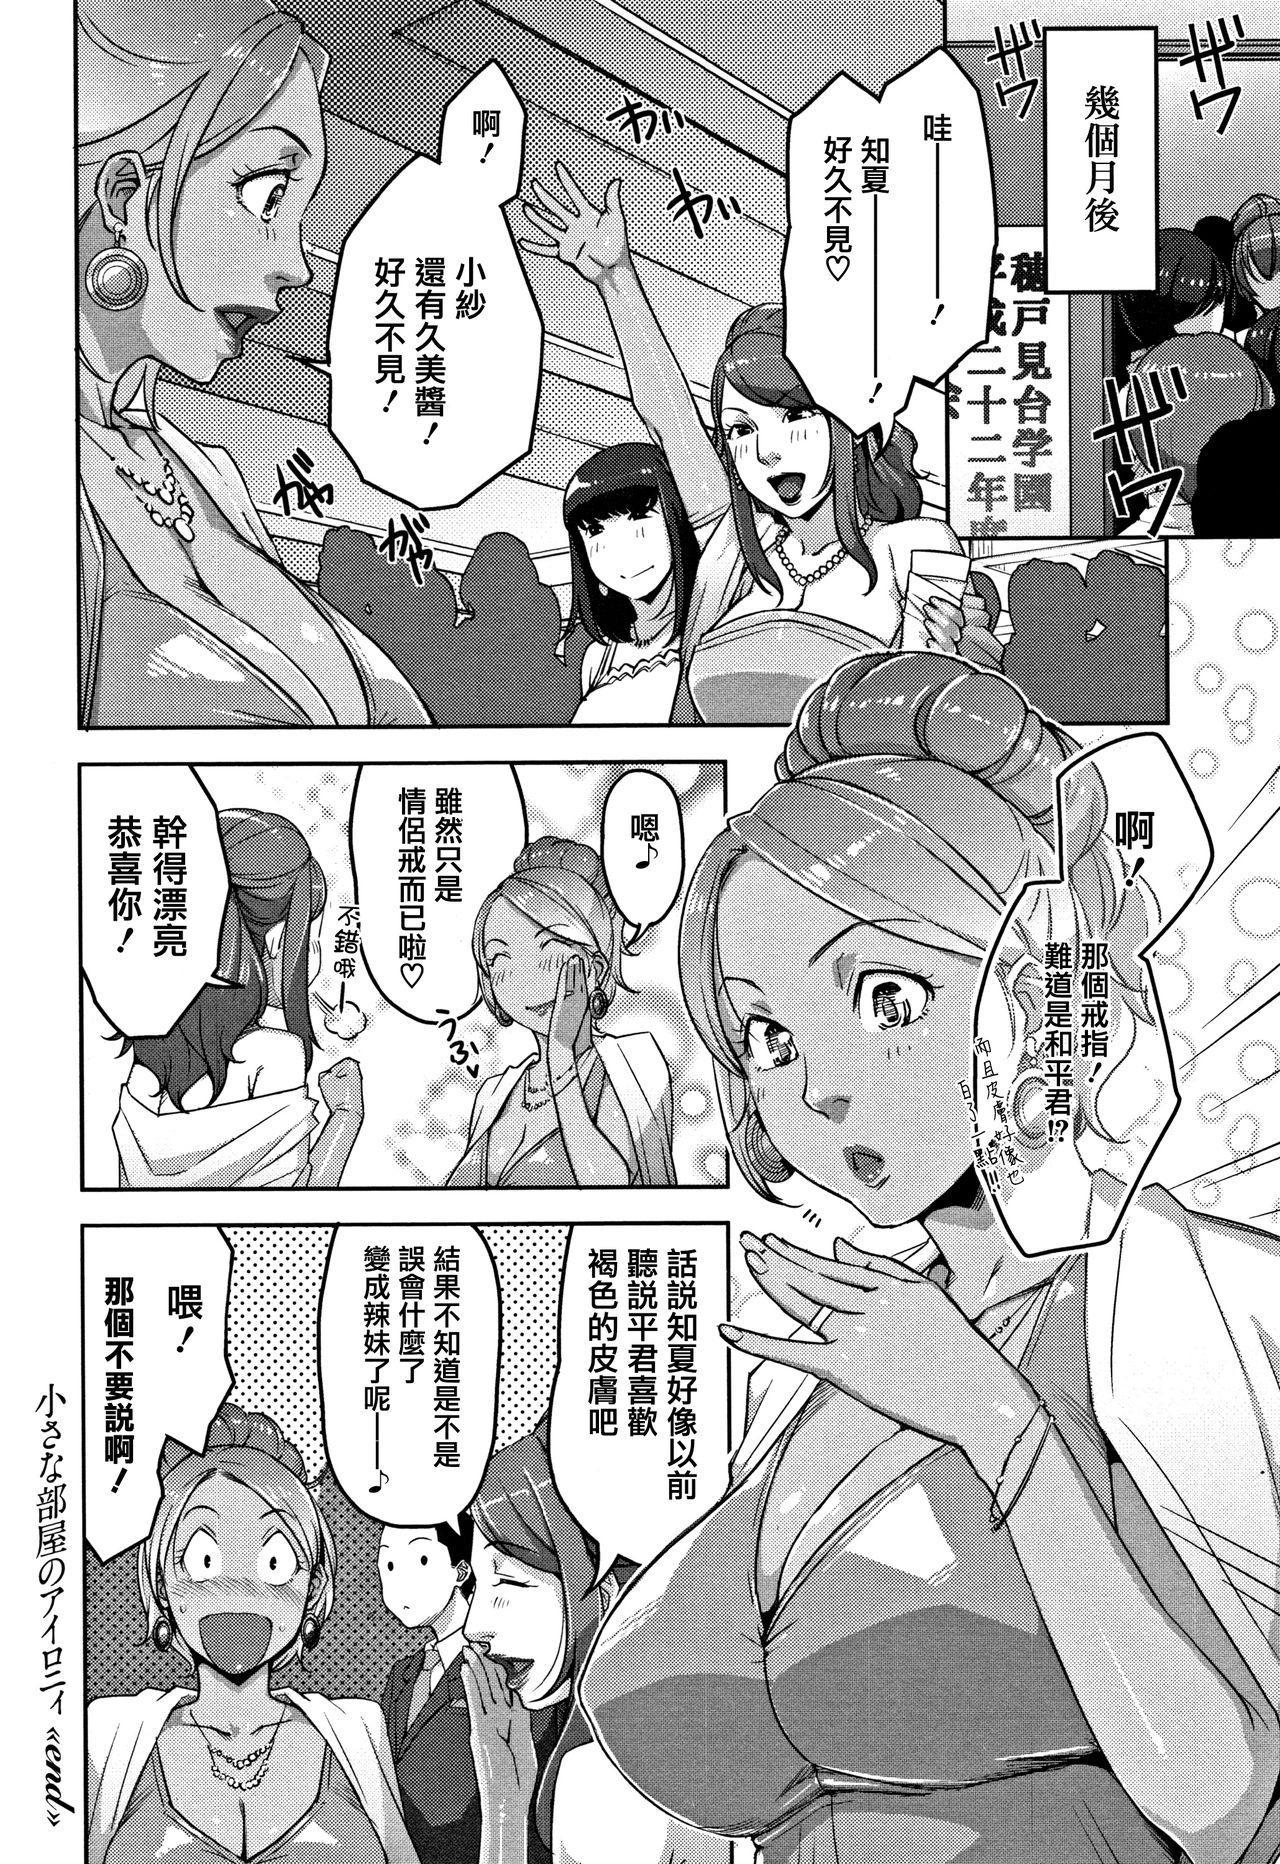 Kanjyuku Chijyo 137